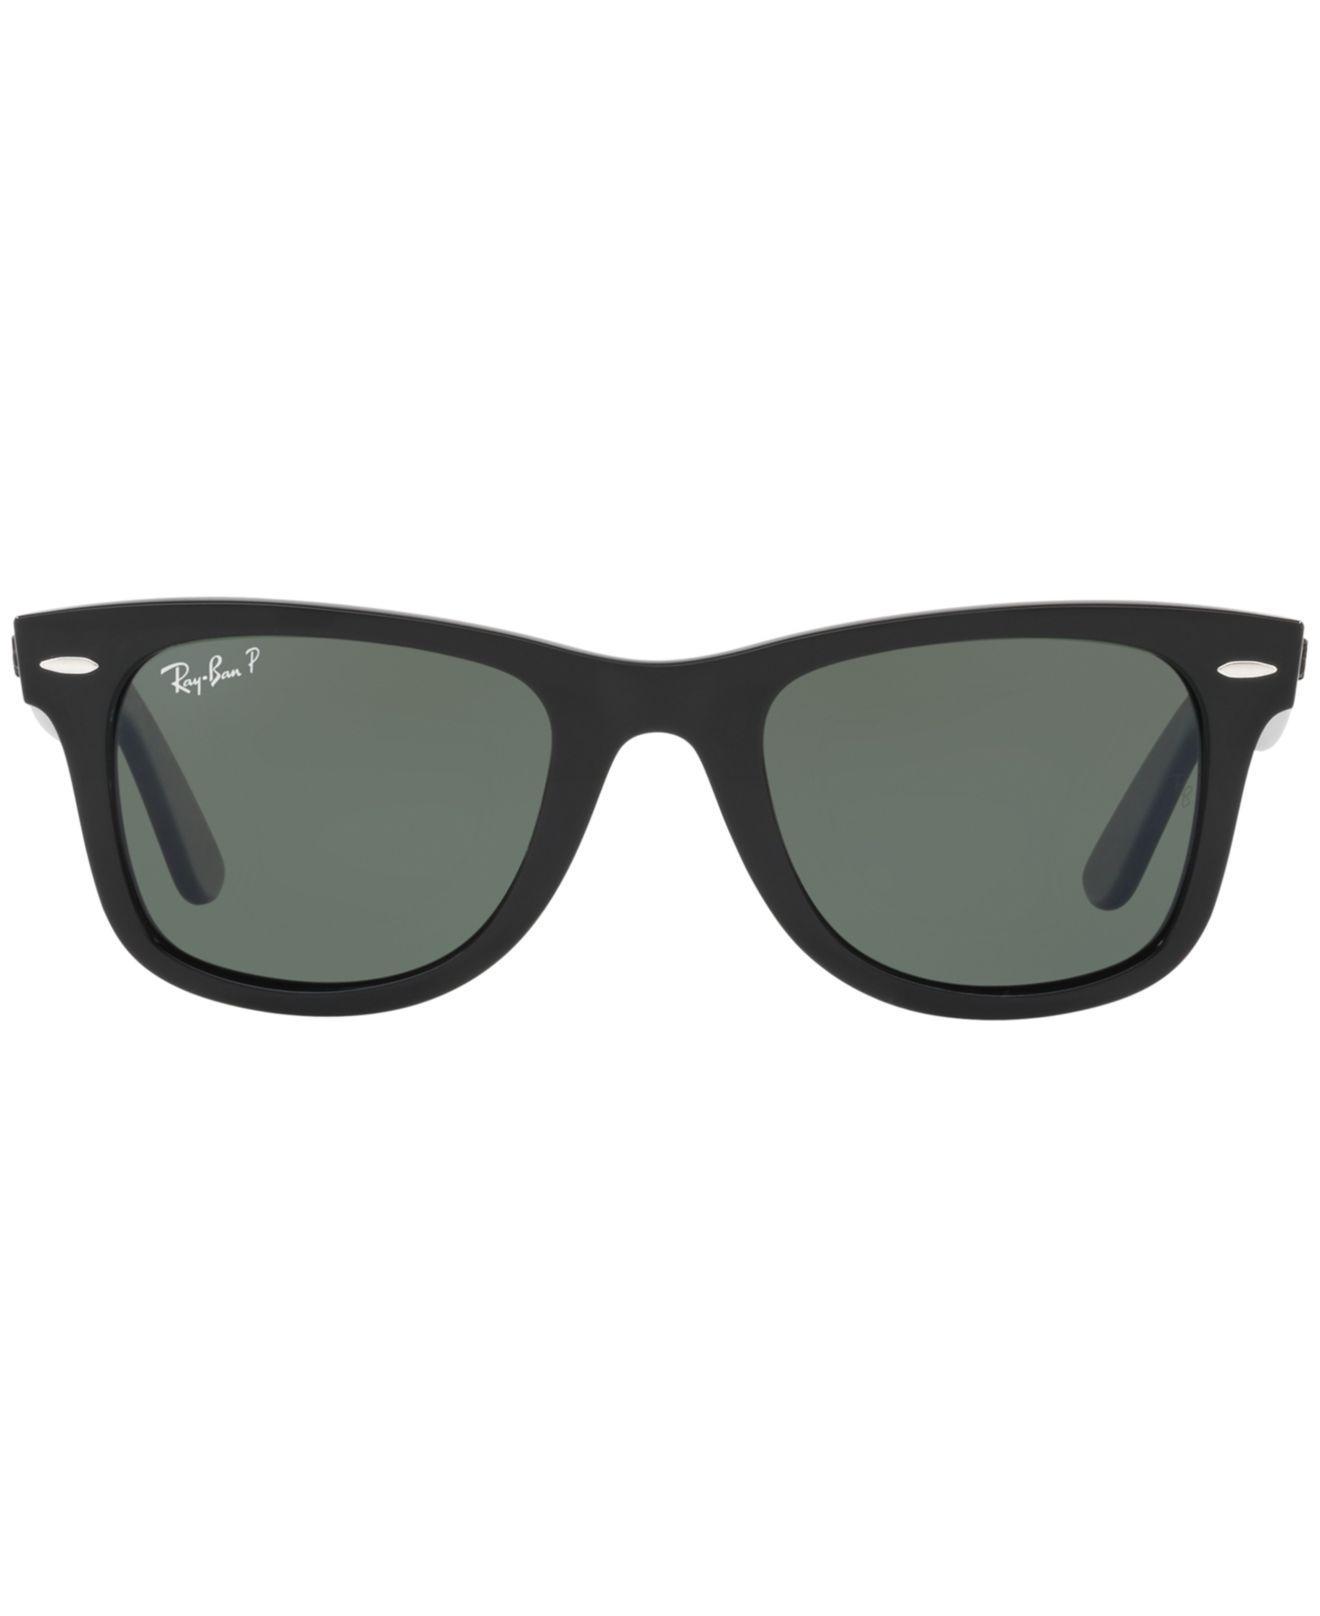 e7b17817494a Lyst - Ray-Ban Polarized Sunglasses